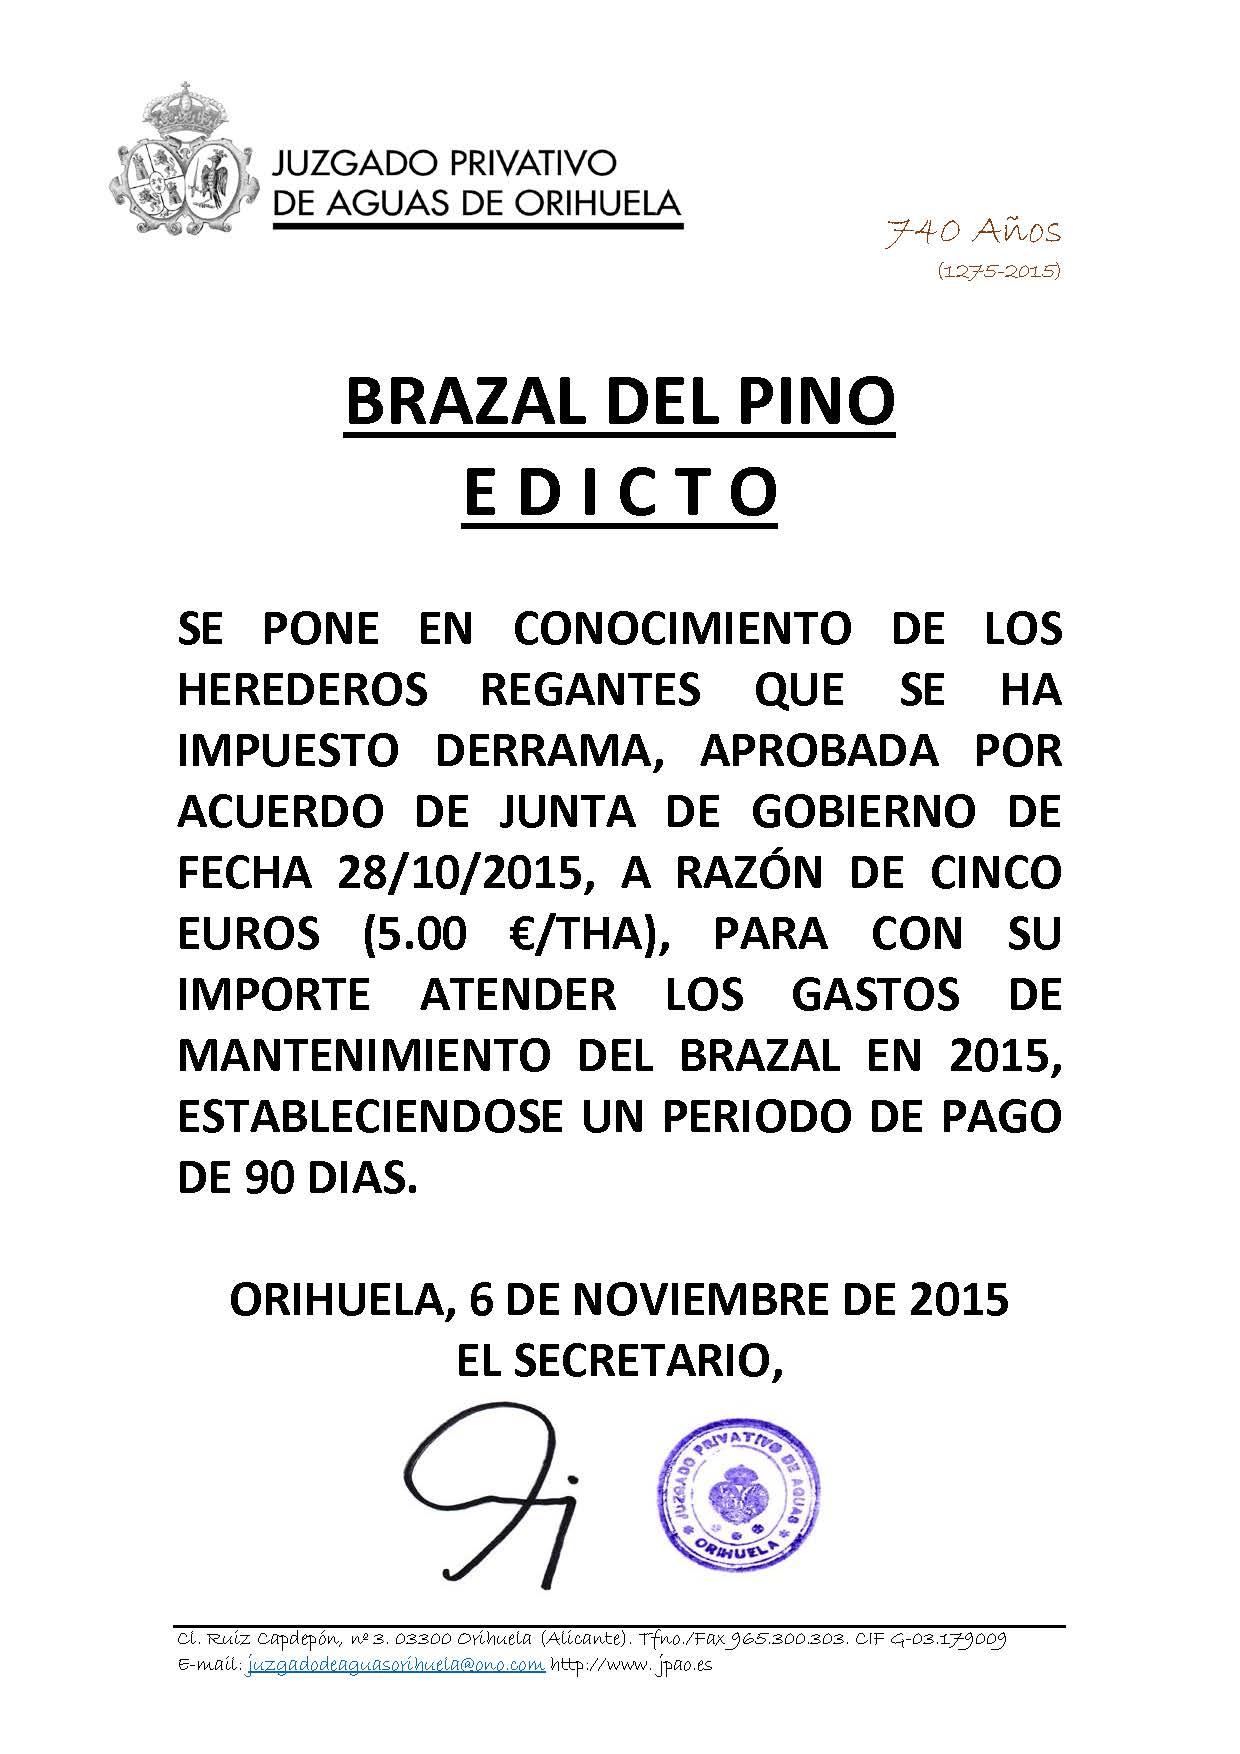 178 2015 BRAZAL DEL PINO. edicto imposicion derrama